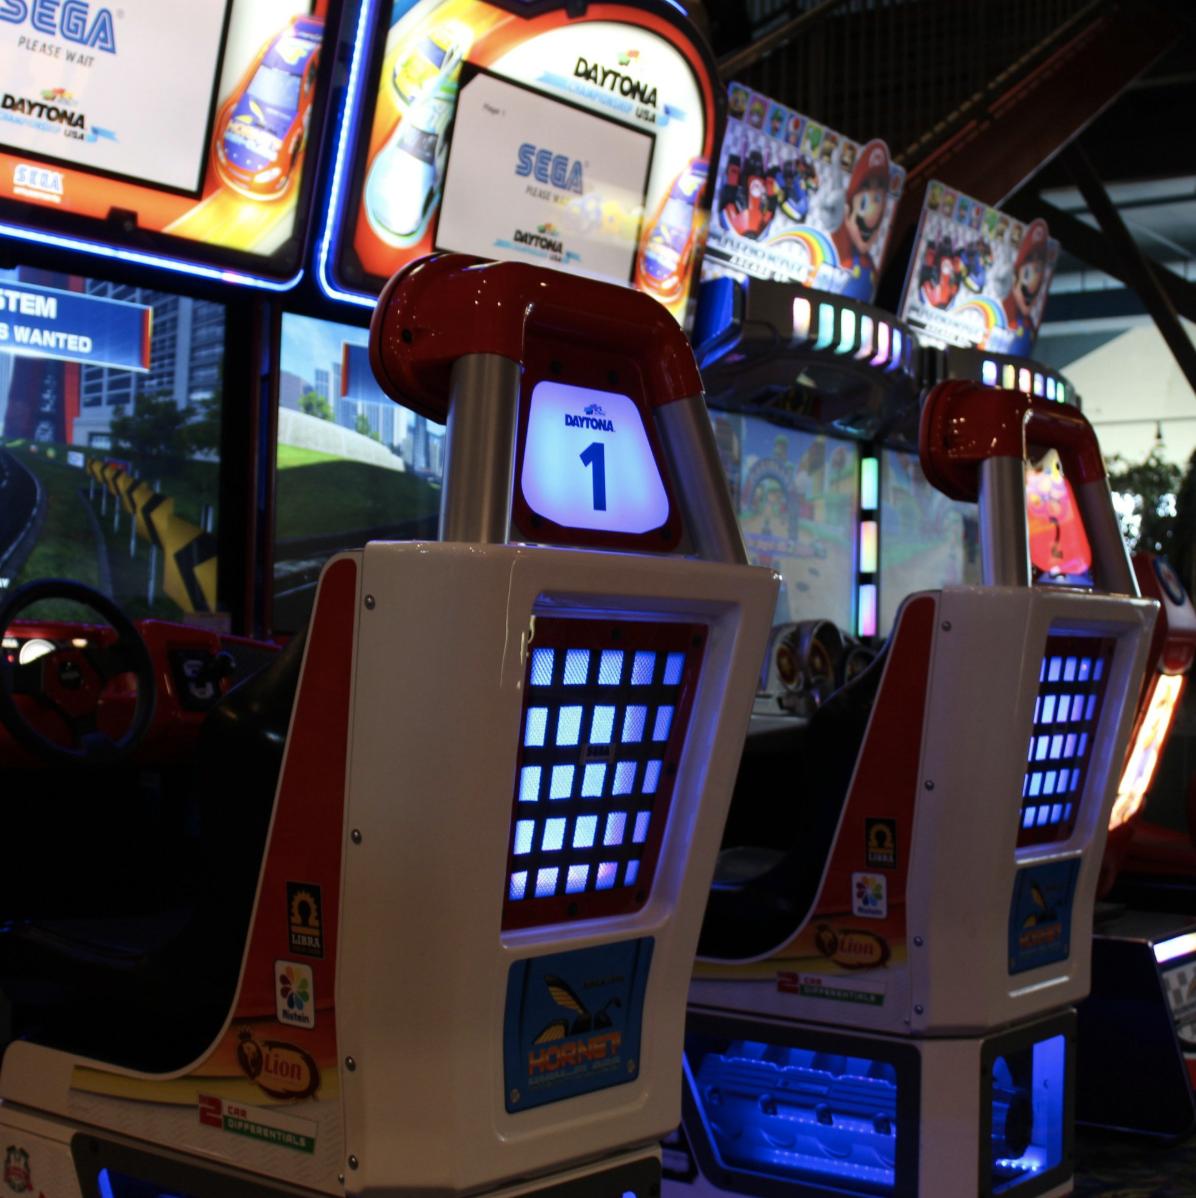 Arcade at Walther's Golf & Fun